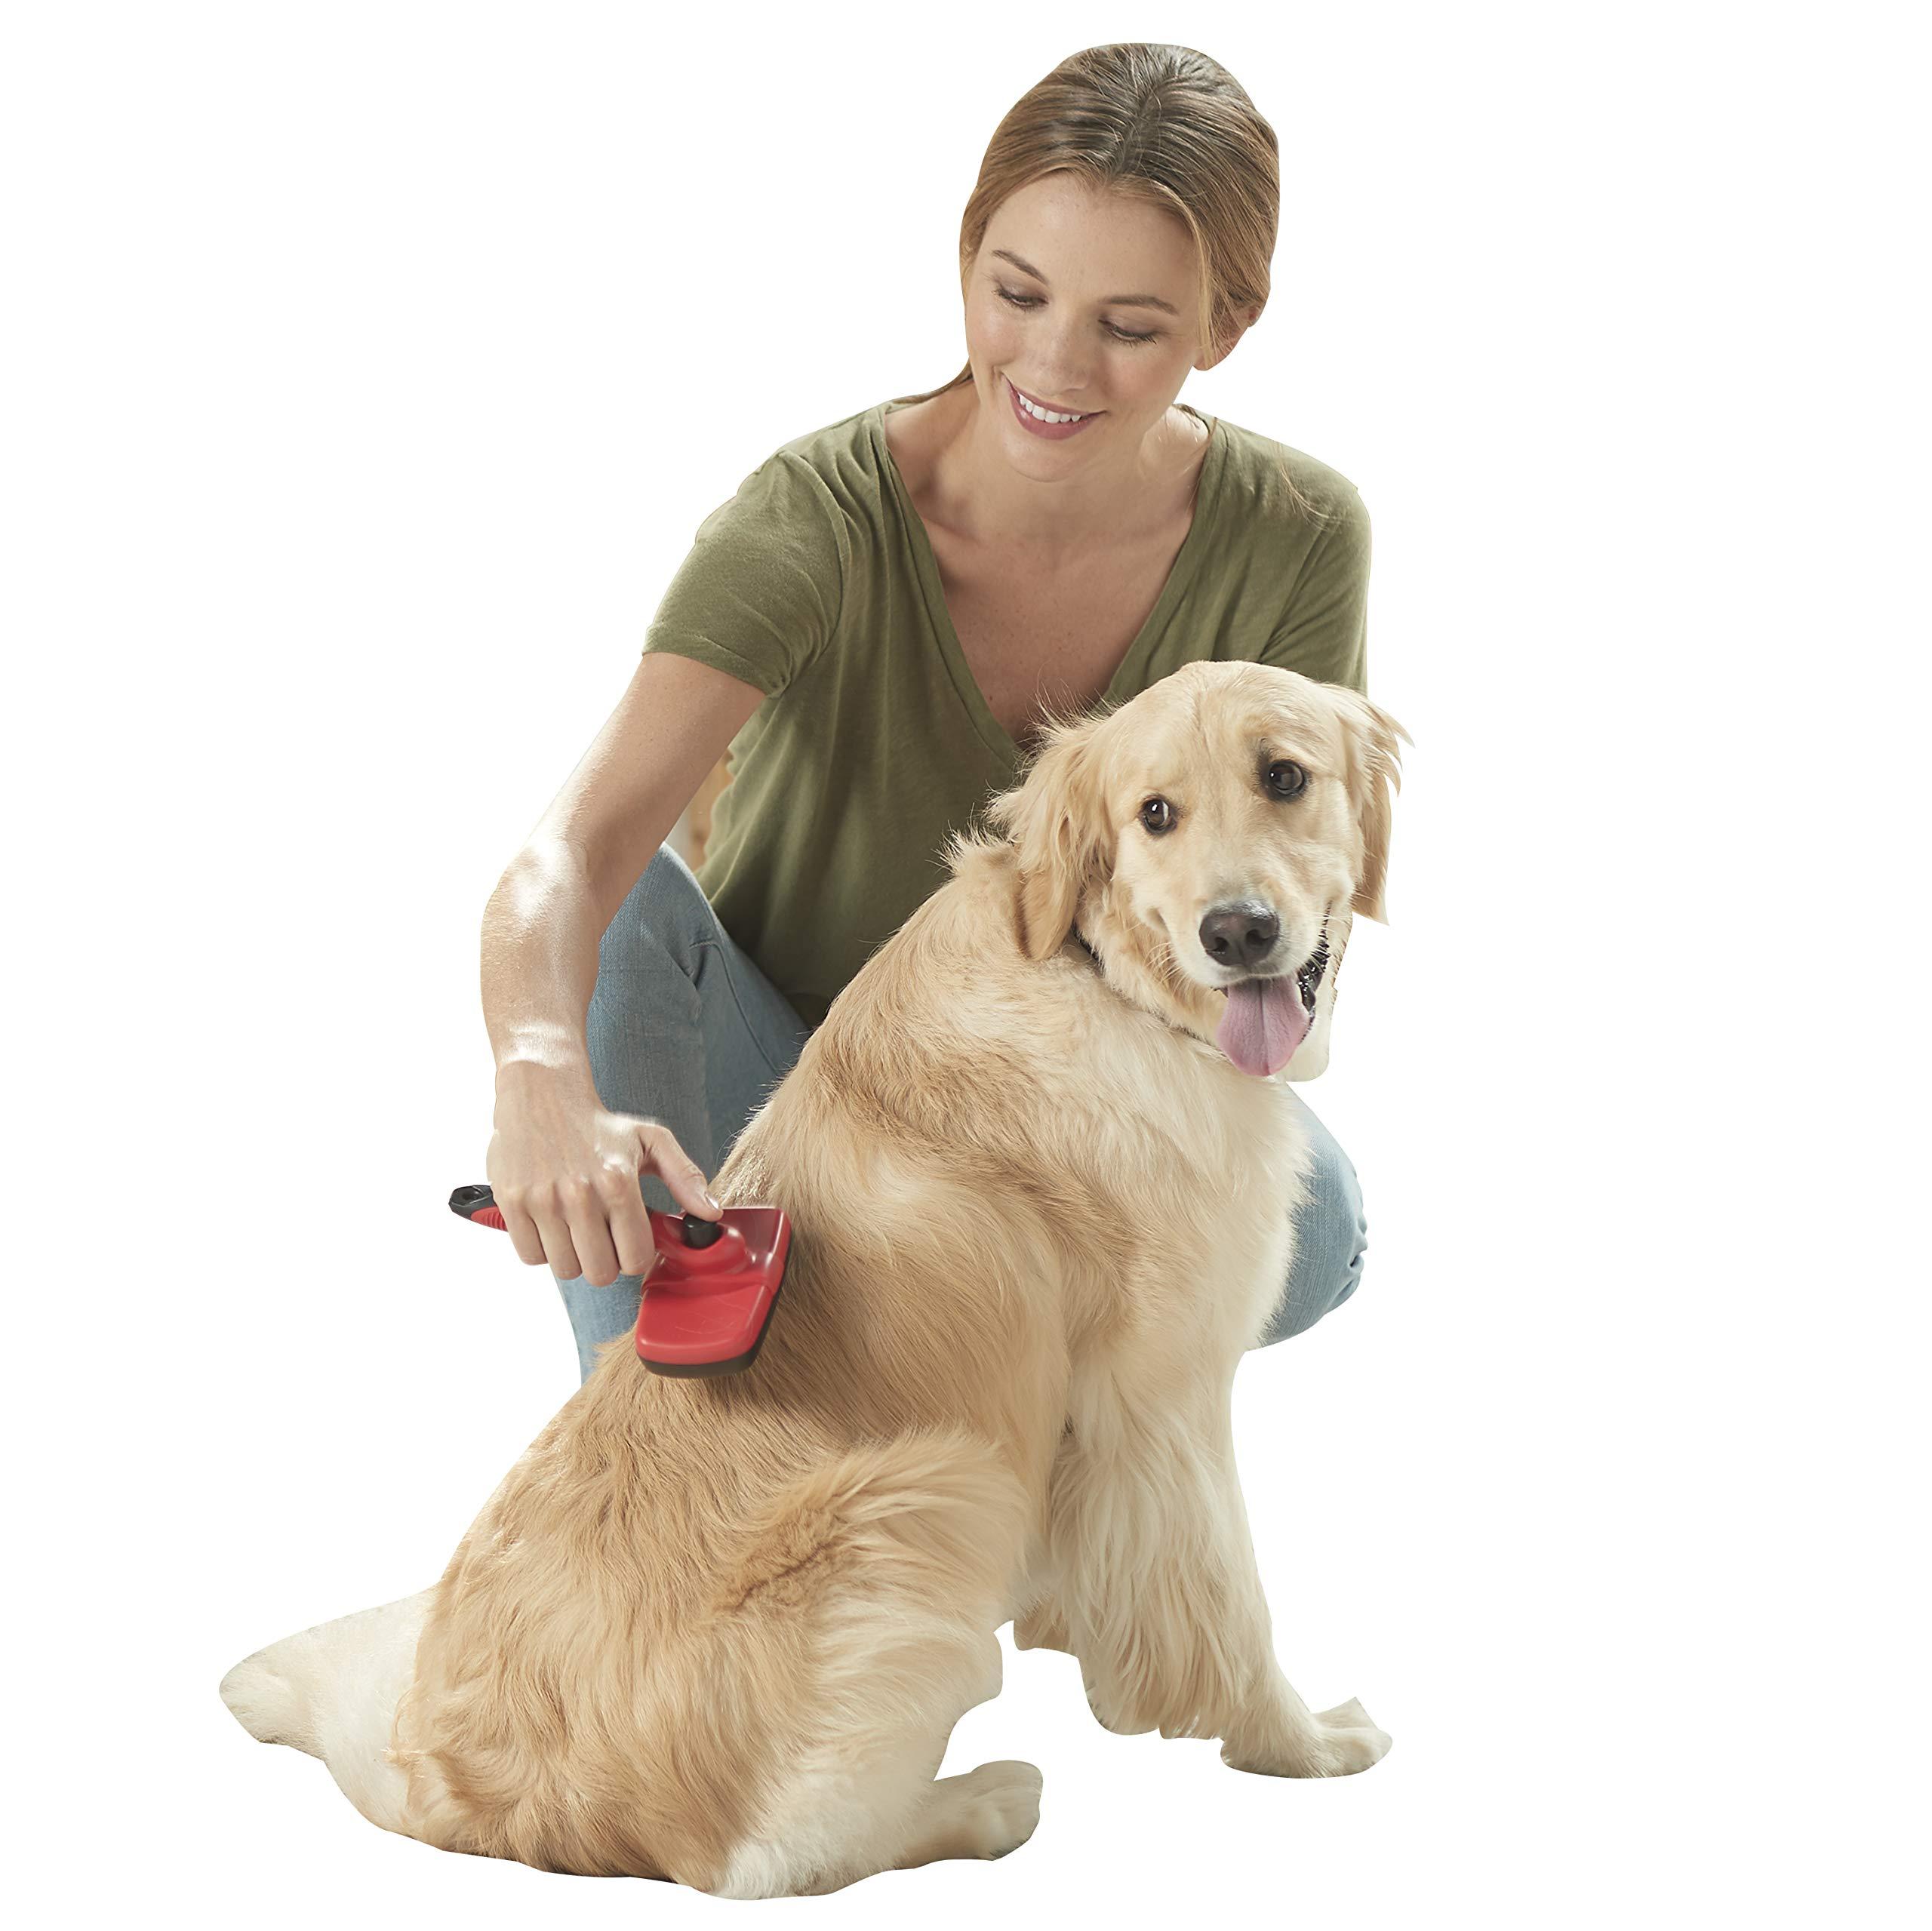 Franklin Pet Supply Shed-Master Dog Grooming Brush - Short Hair - De-Shedding Dogs - Reduce Shedding - Self-Cleaning